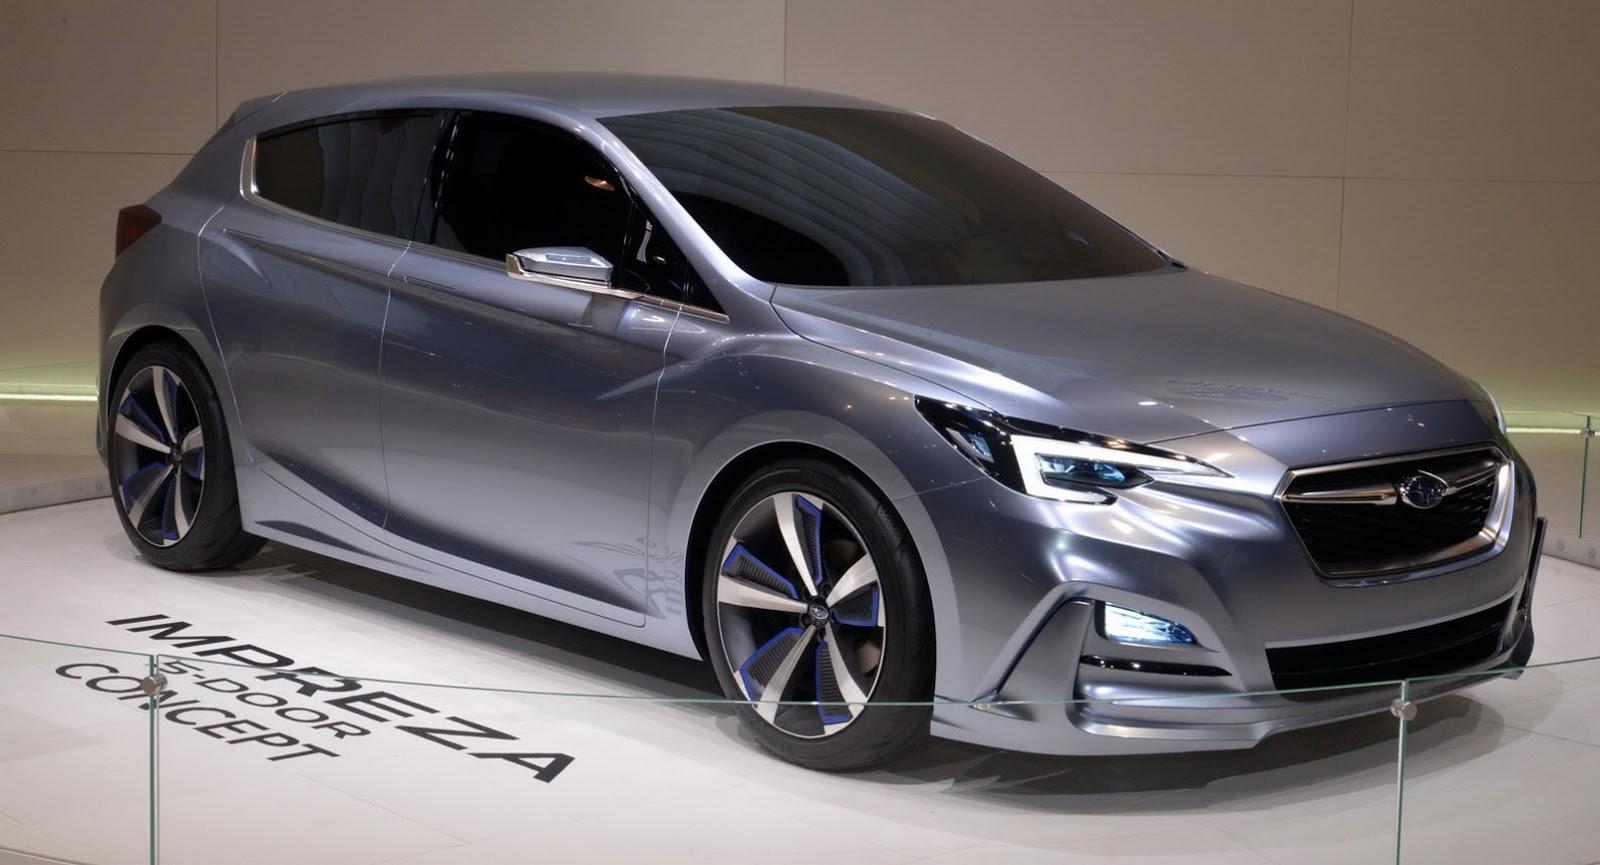 2017 subaru impreza hatchback ny daily news 2017 2018 best cars 2017 2018 best cars reviews